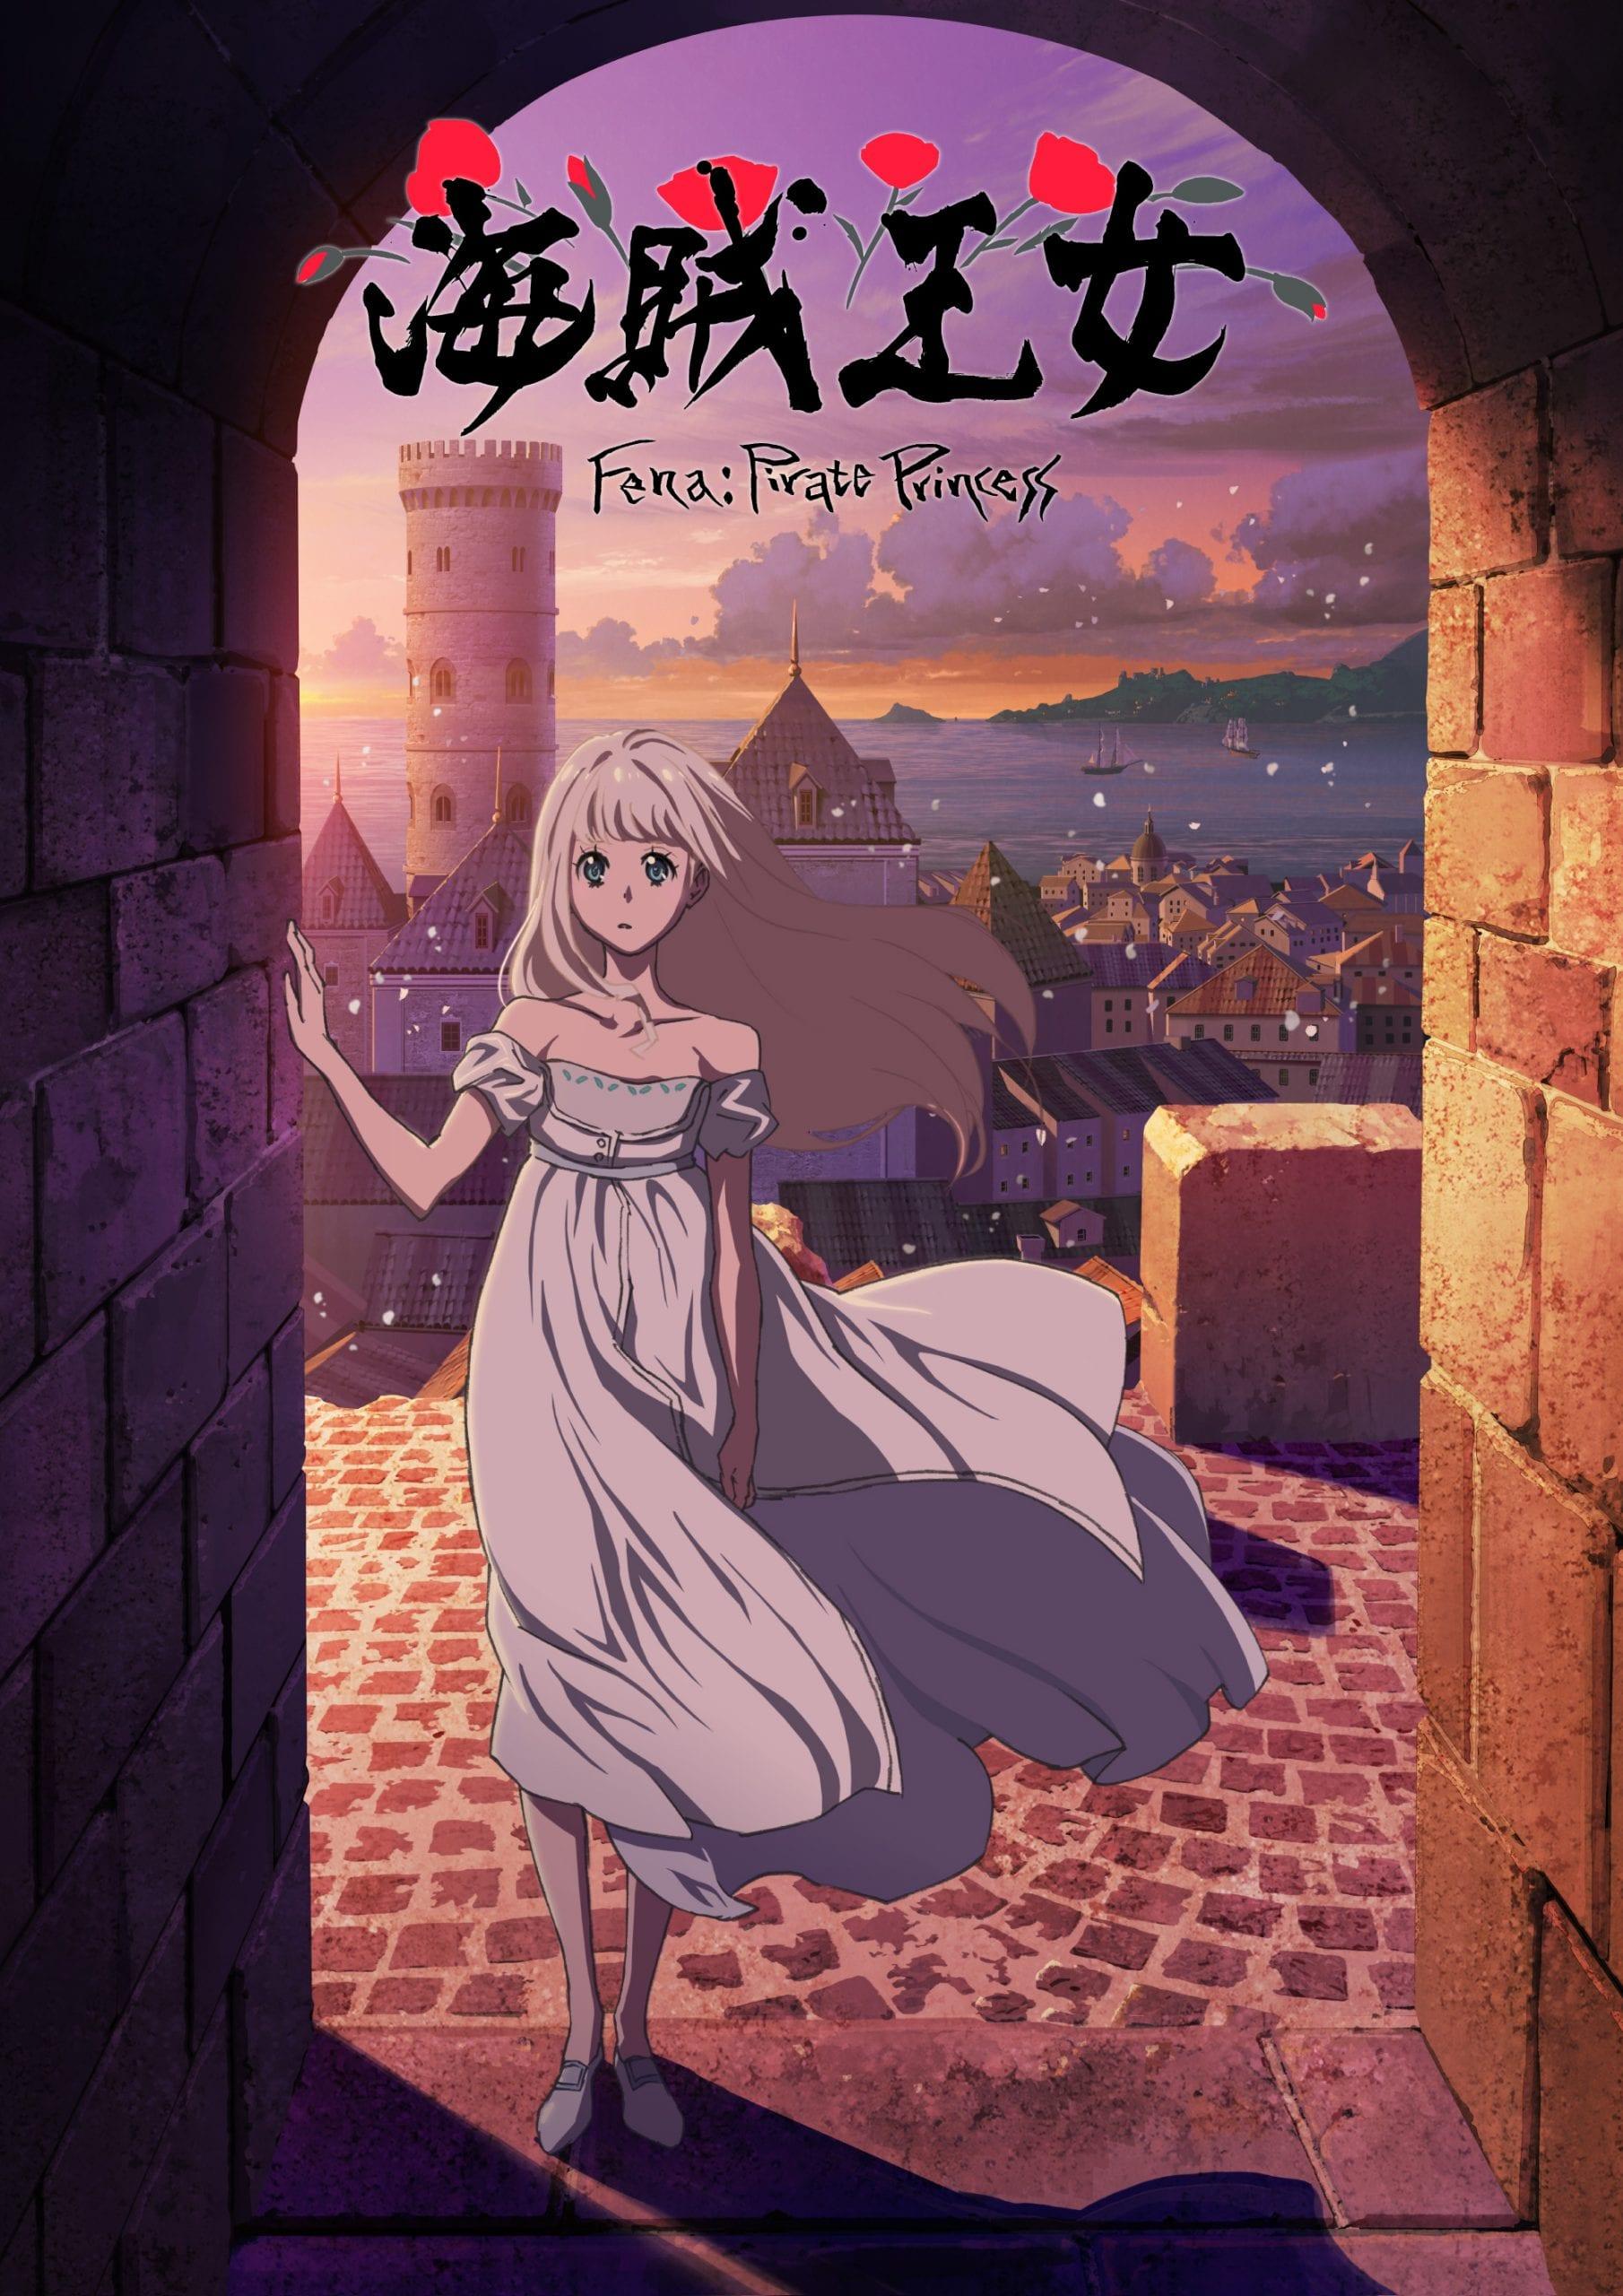 Fena: Pirate Princess Anime Release Date